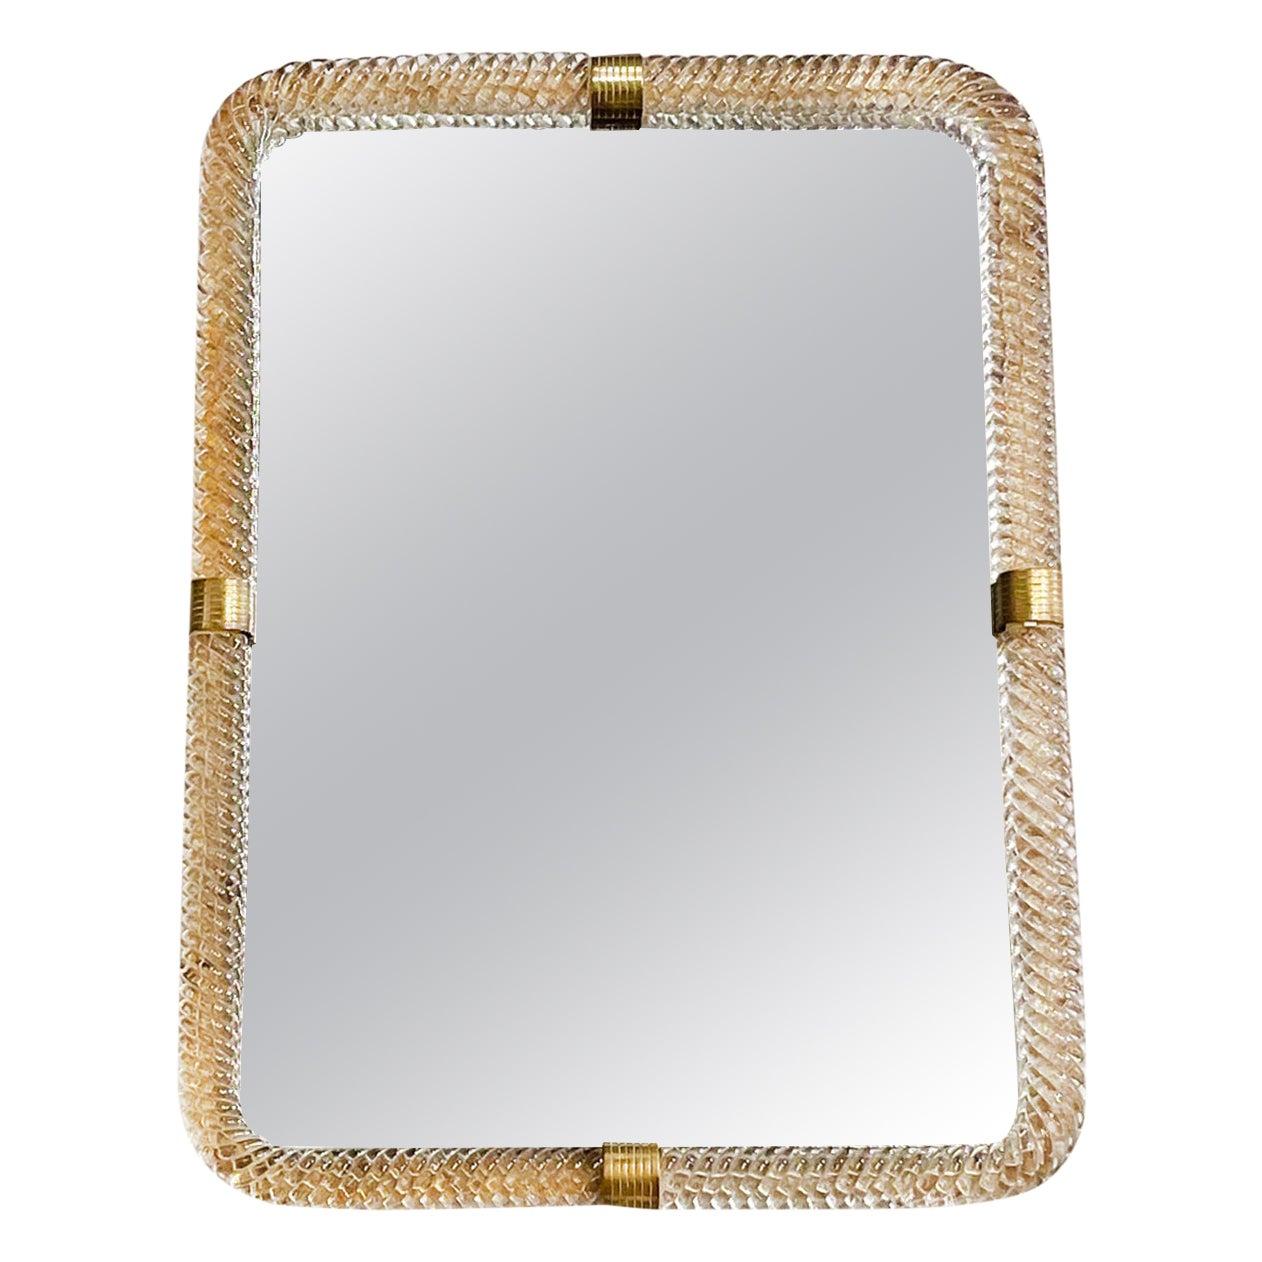 20th Century Italian Murano Glass, Brass Wall Mirror by Barovier & Toso